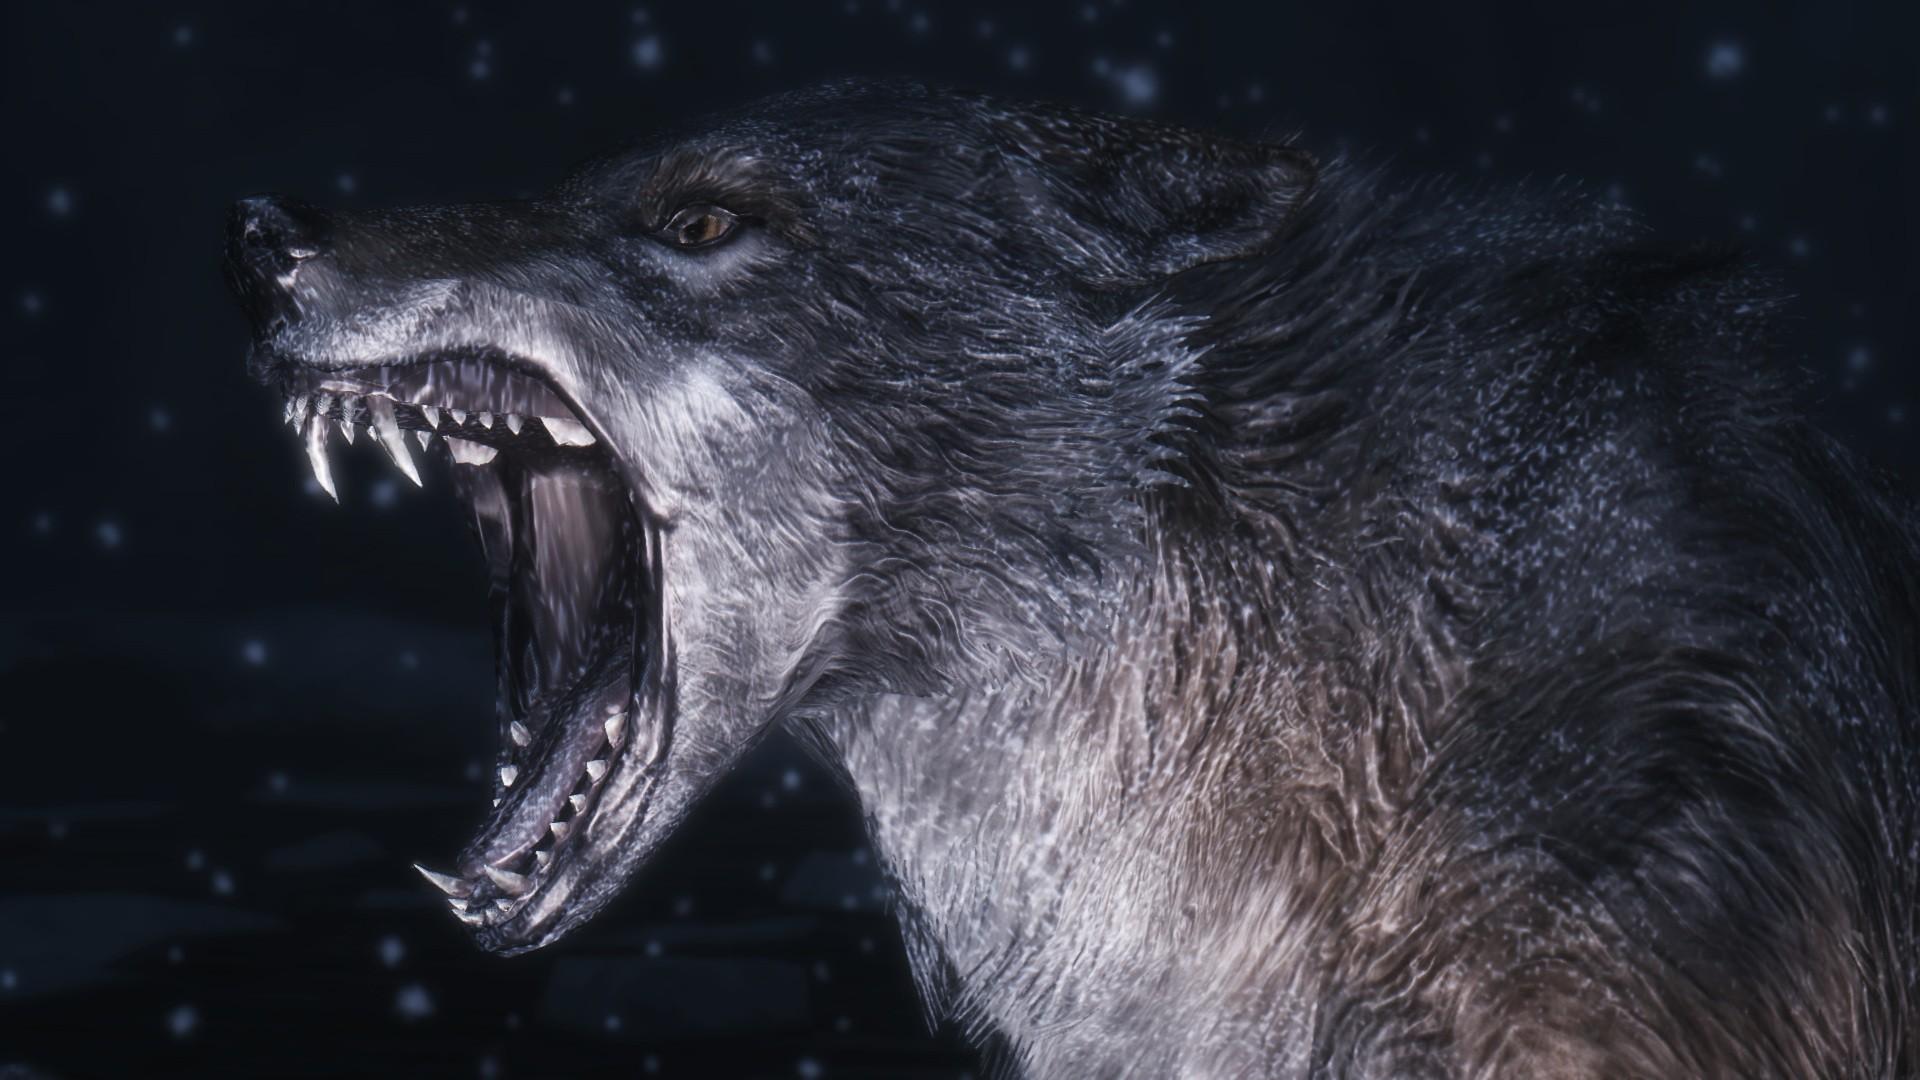 Wolf Computer Wallpapers, Desktop Backgrounds | | ID:309182